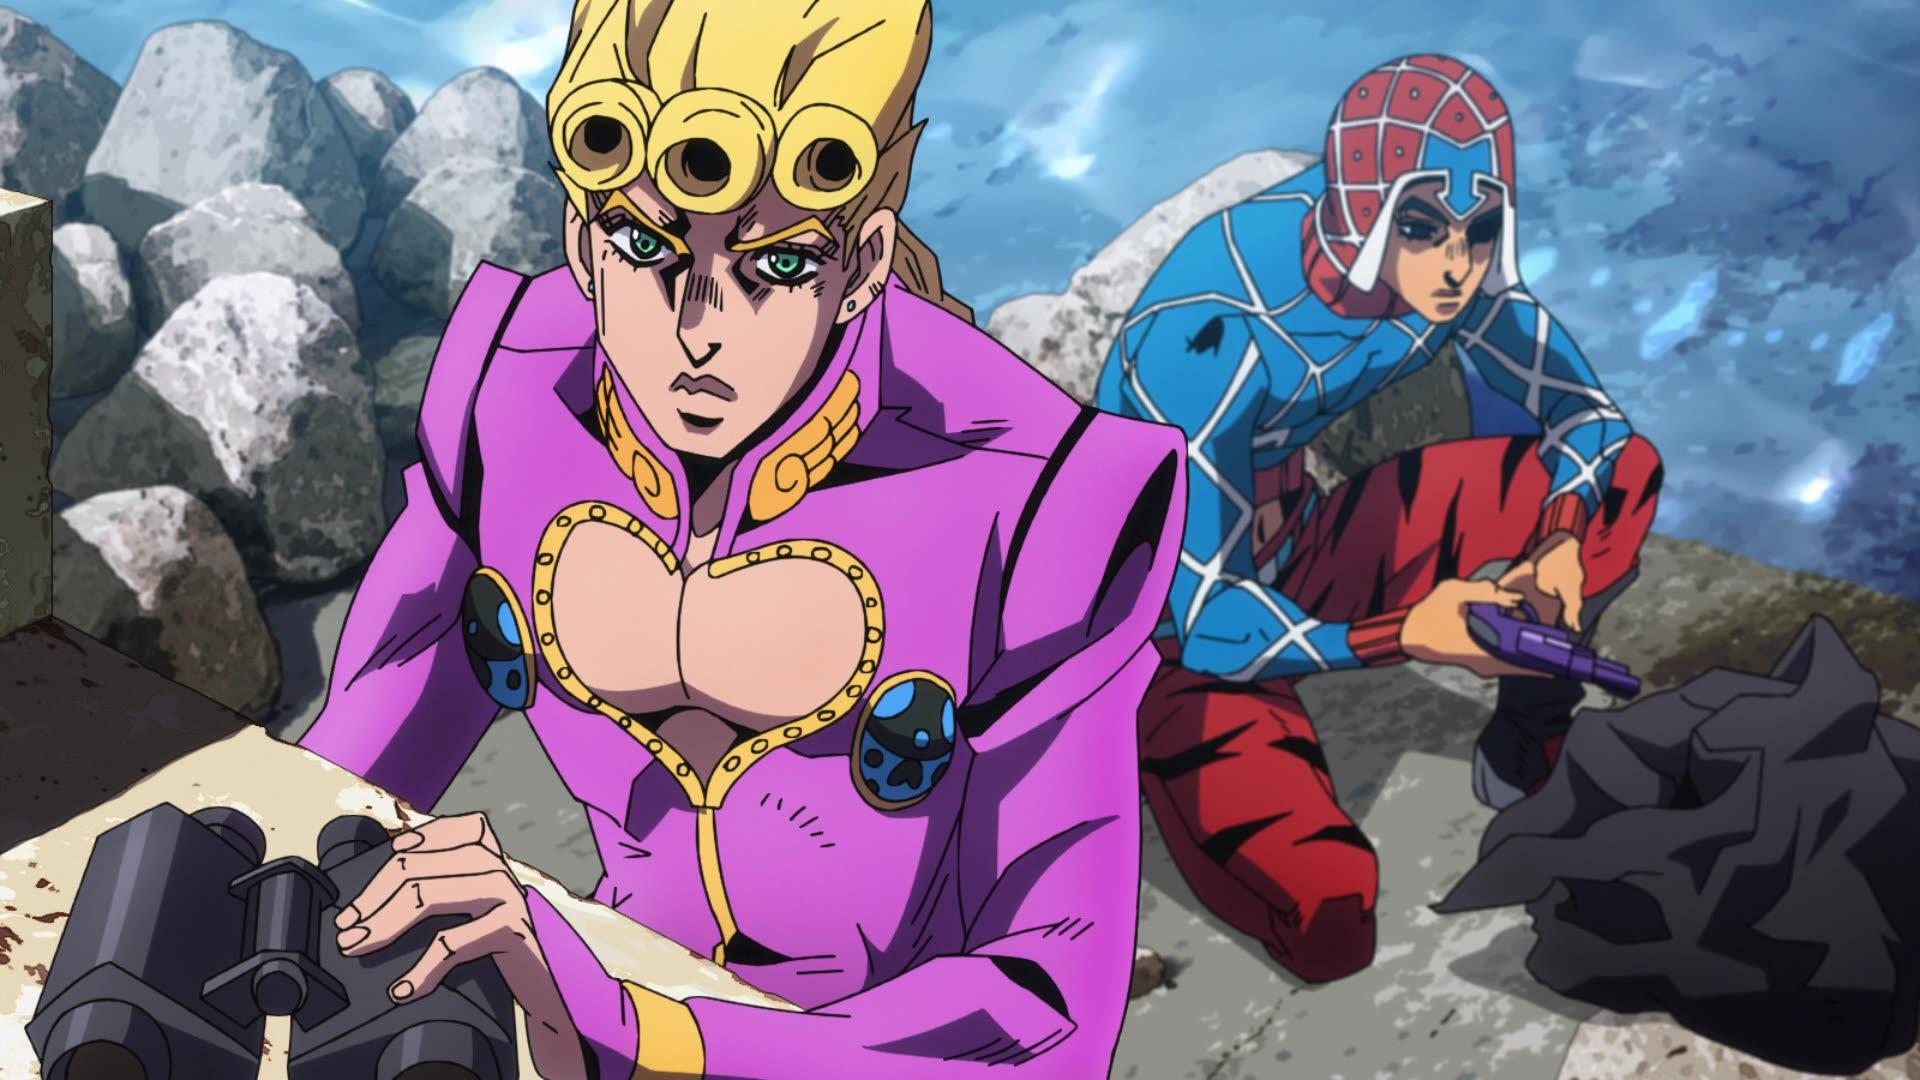 JoJo's Bizarre Adventure: Golden Wind Episode 7, Six Bullets